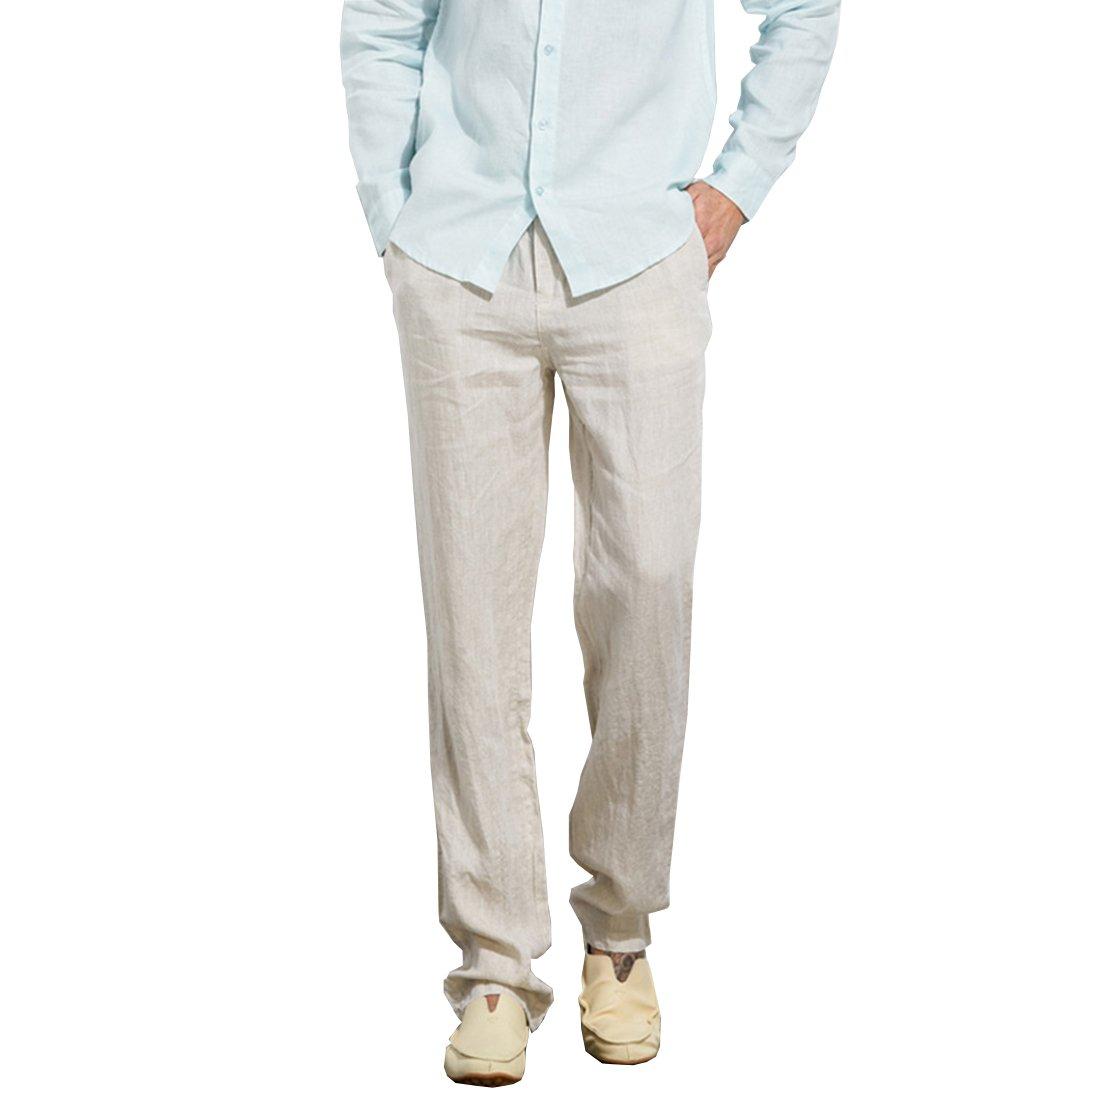 Manwan walk Men's Casual Beach Trousers Elastic Loose Fit Lightweight Linen Summer Pants K70 (XX-Large, Beige)